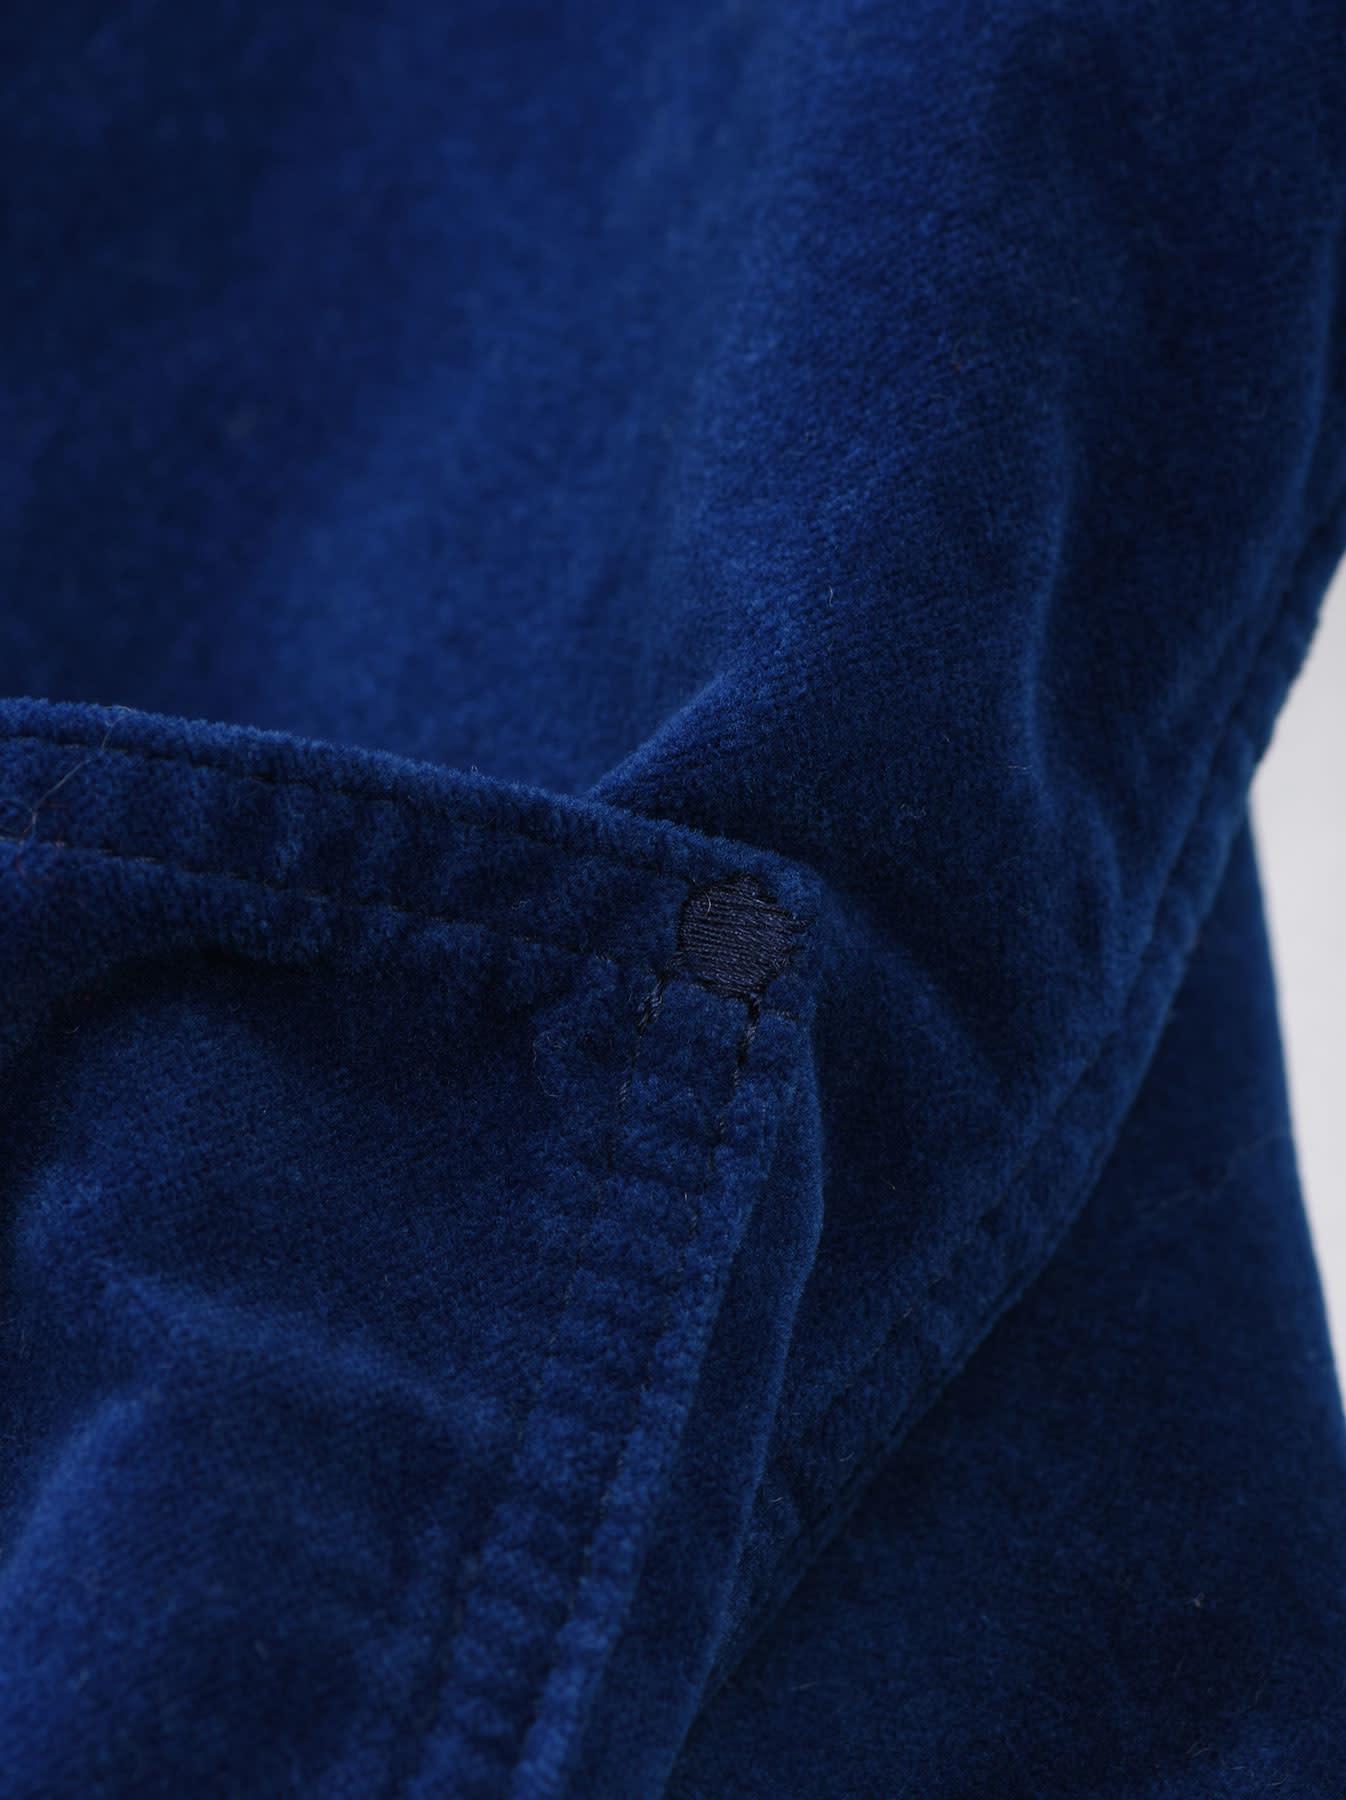 Indigo Velveteen 908 Denim Jacket-6